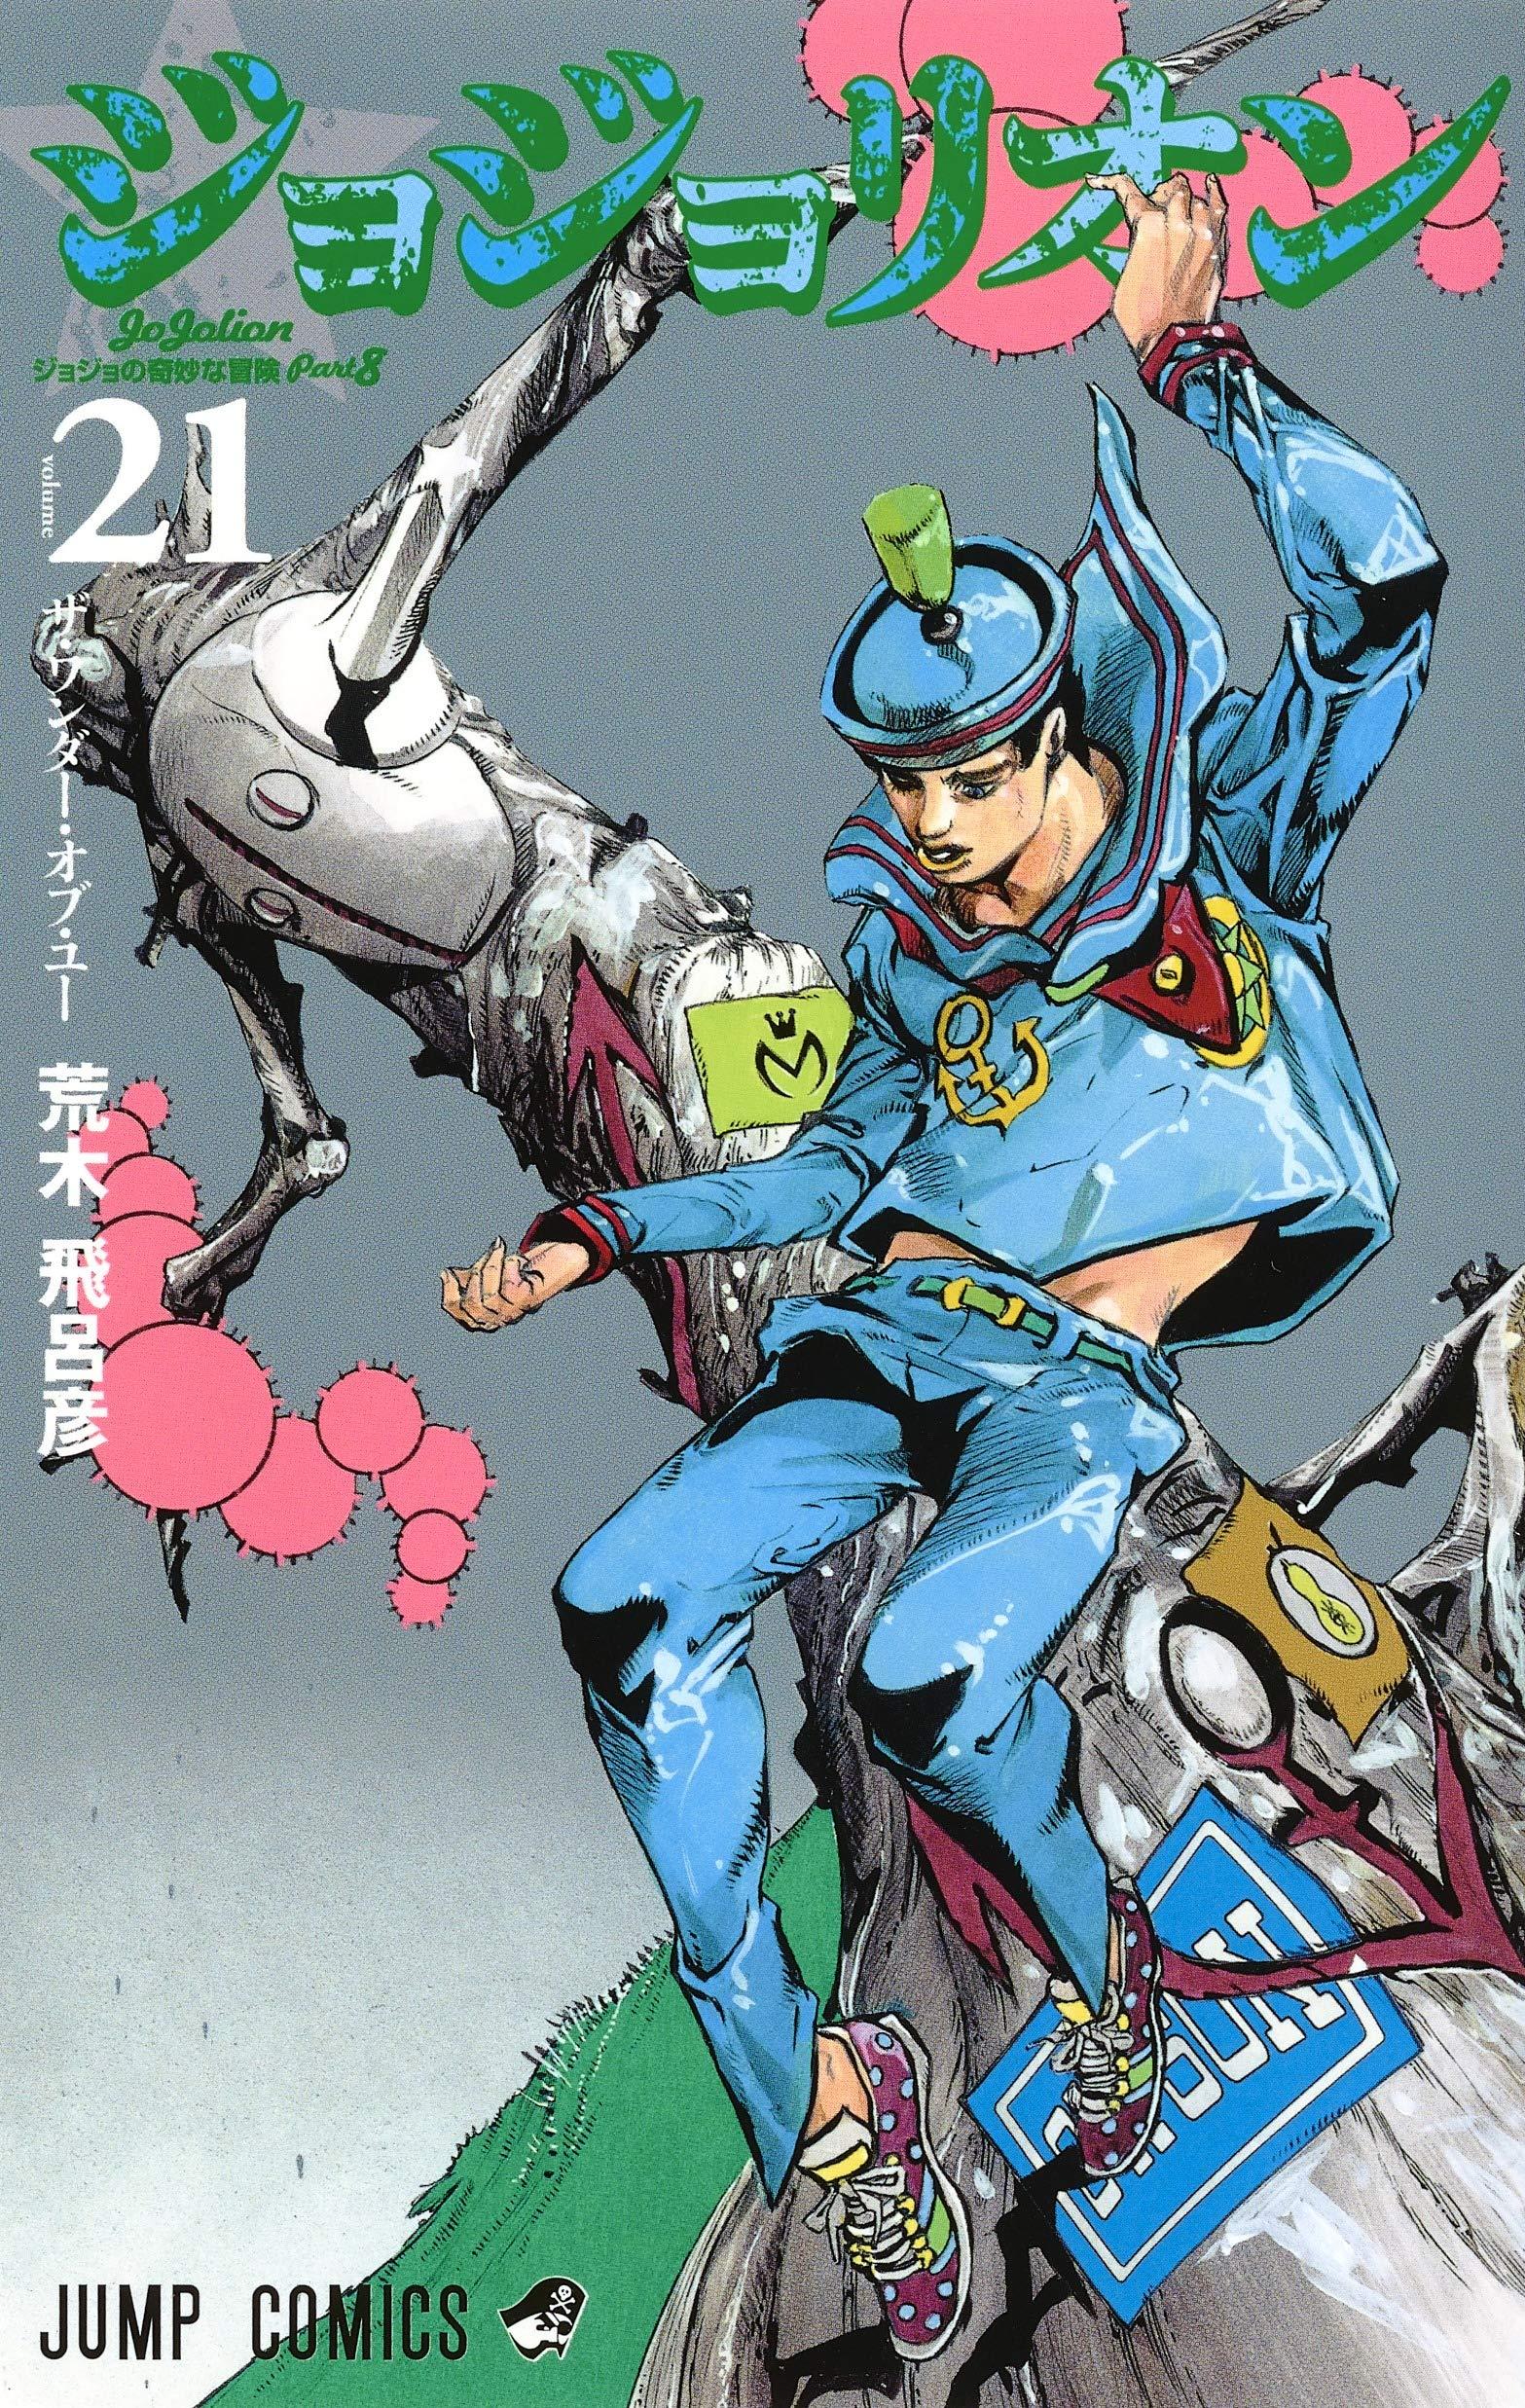 Jojolion 12 Jump Comics